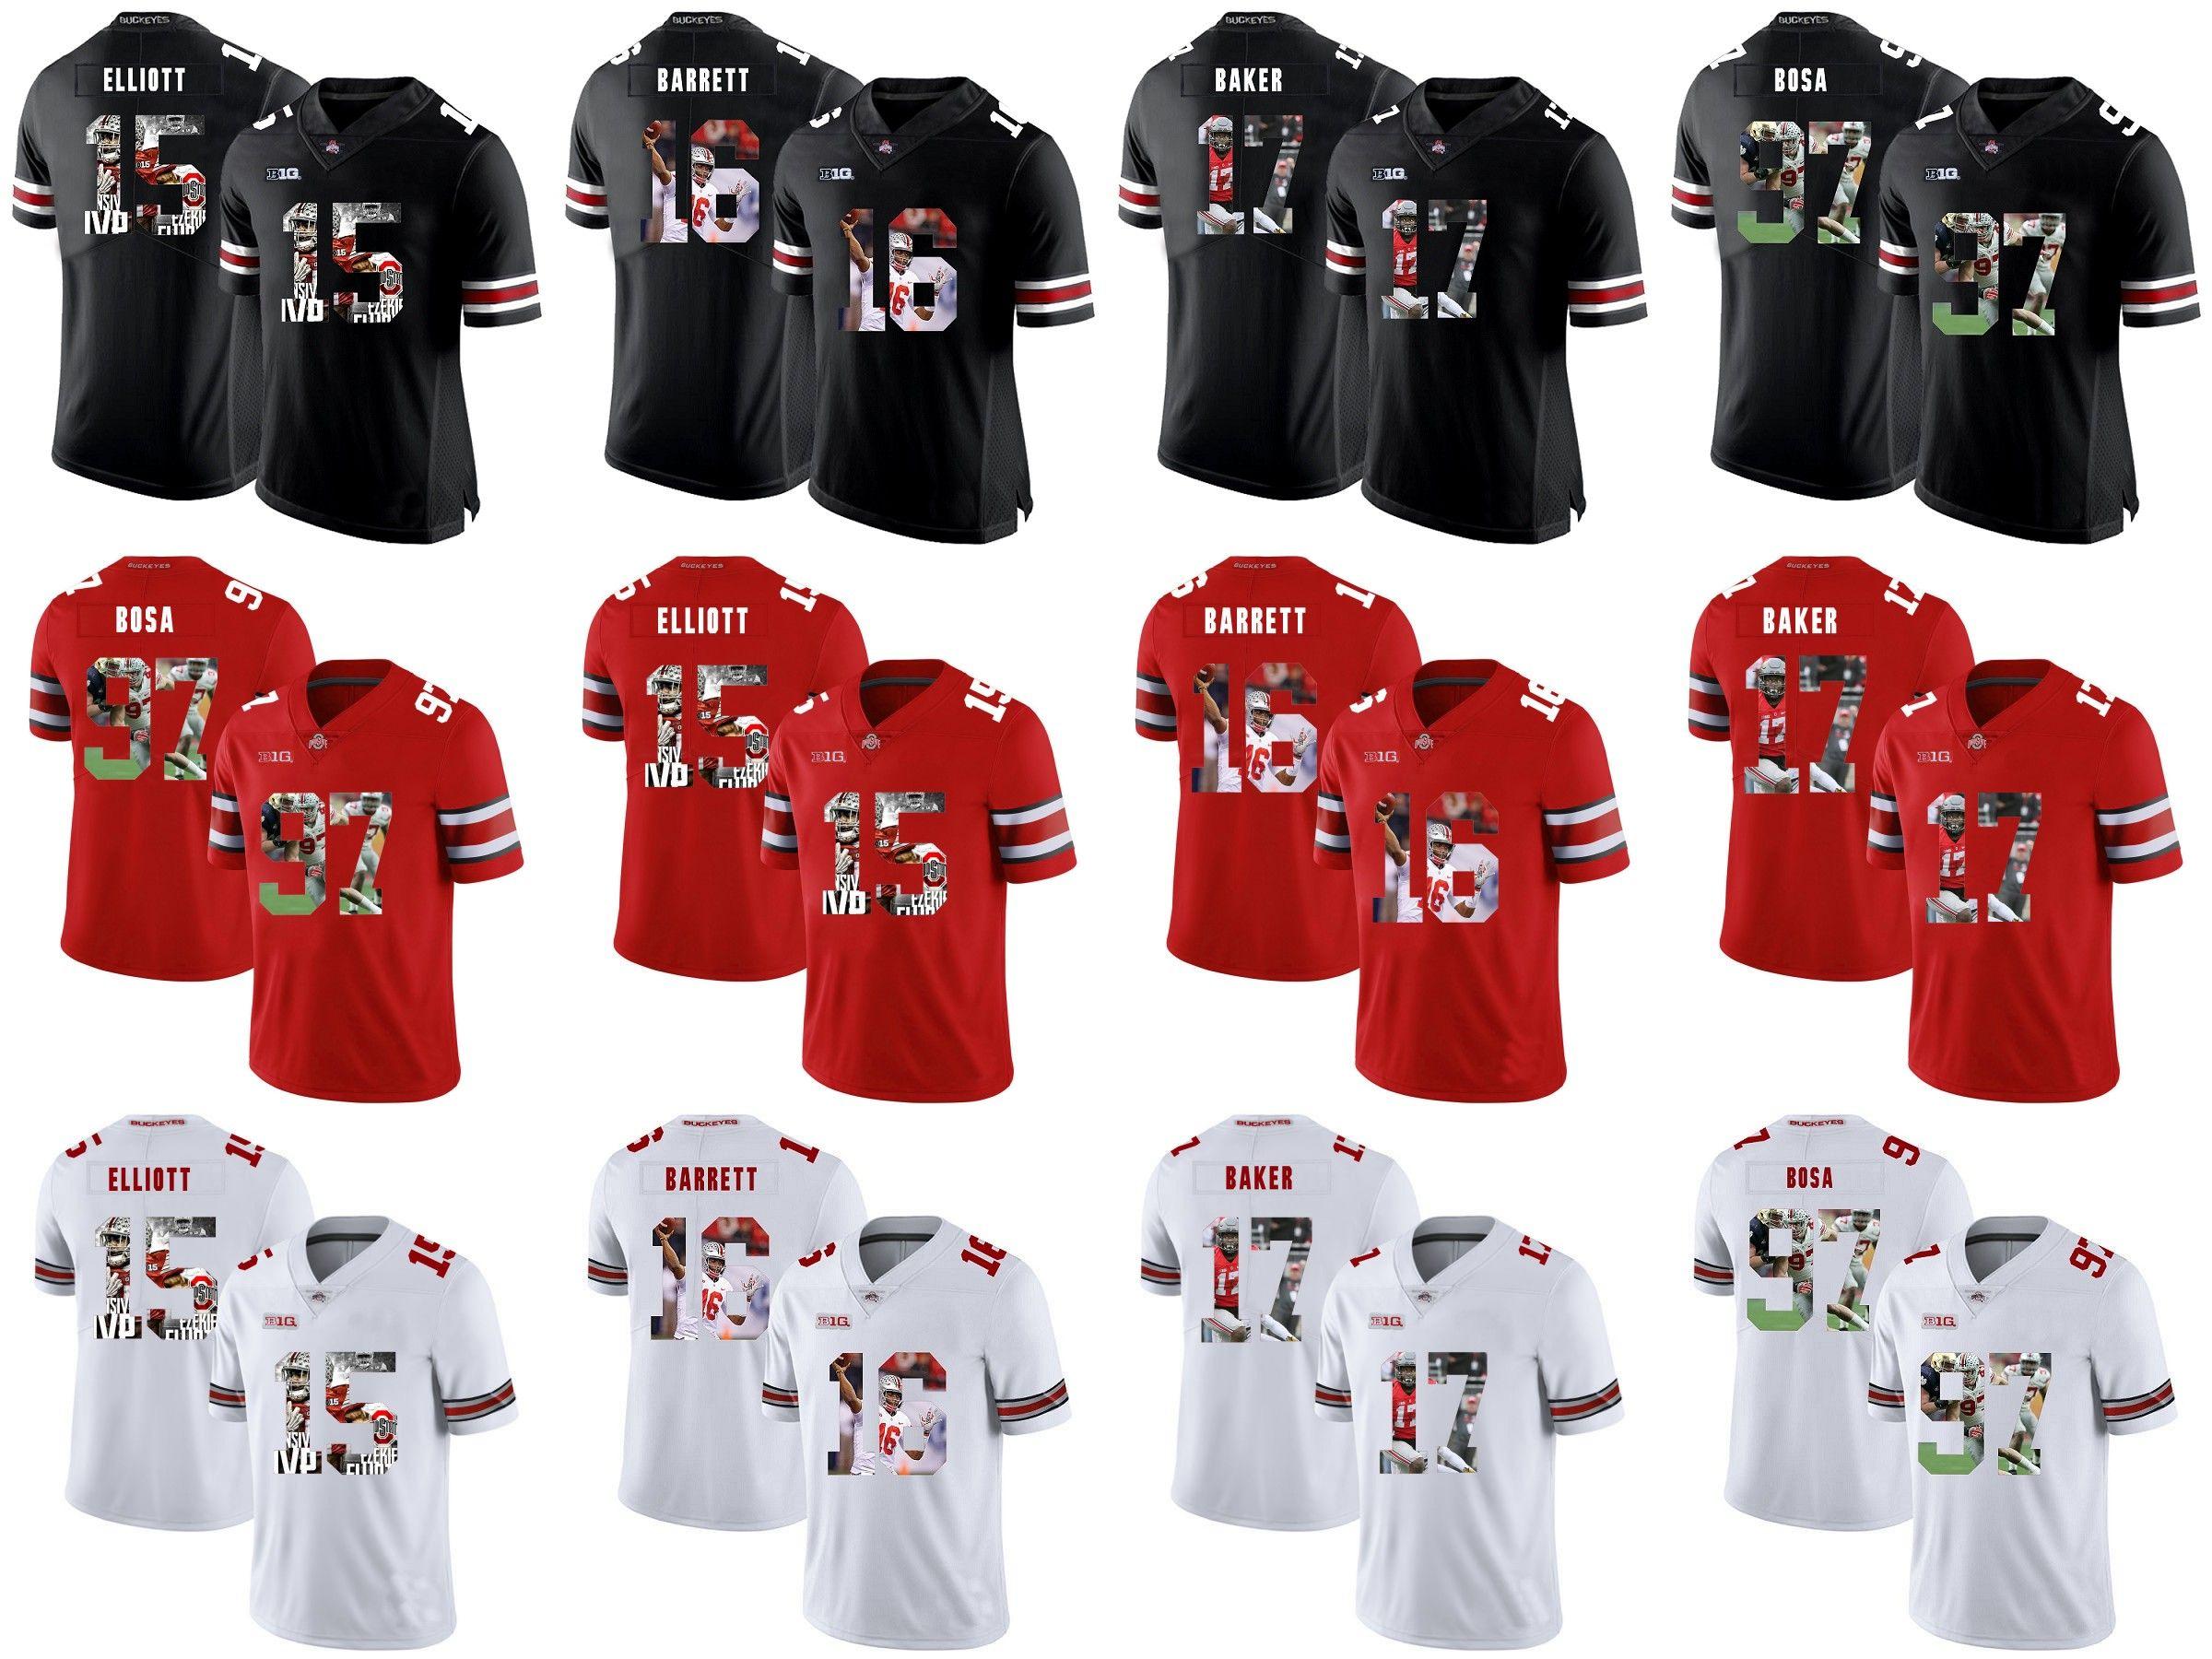 buy popular 2f395 72d0c Ohio State Buckeyes # Ezekiel Elliott J.T. Barrett Jerome Baker Joey Bosa  College Football Stitched Jerseys White Black Red